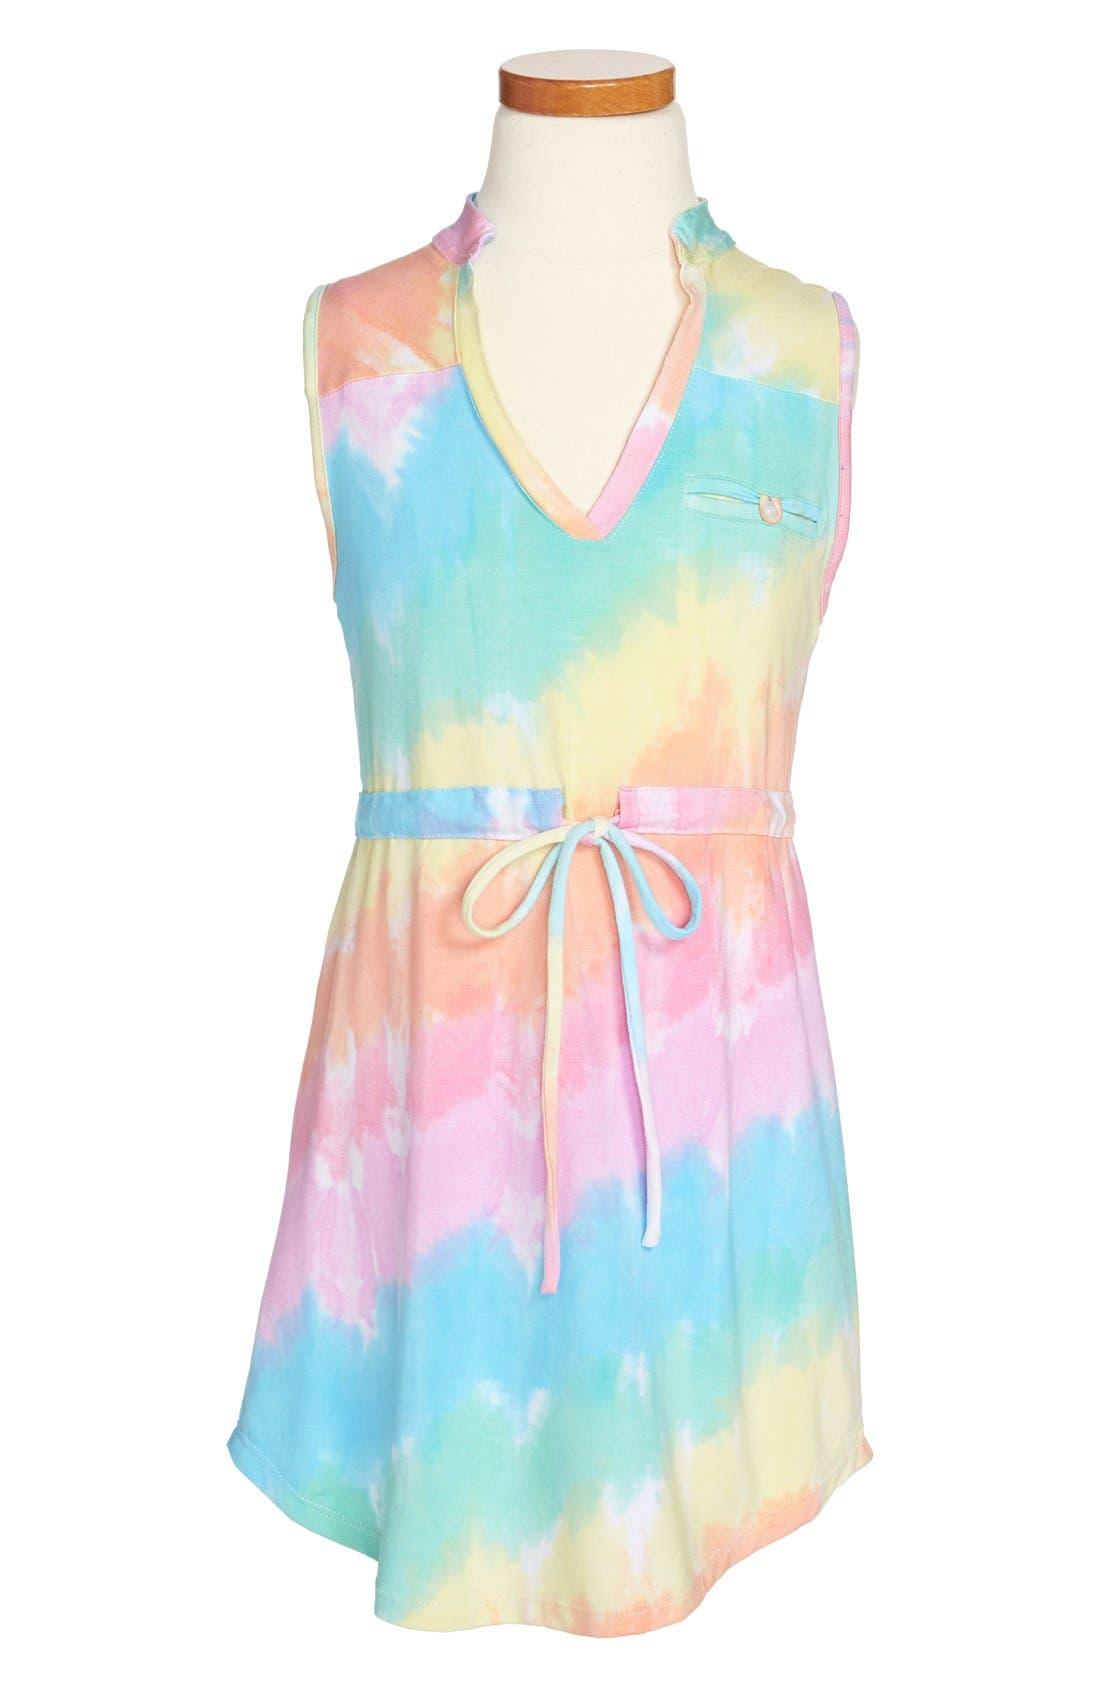 Alternate Image 1 Selected - Flowers by Zoe Tie Dye Sleeveless Dress (Big Girls)